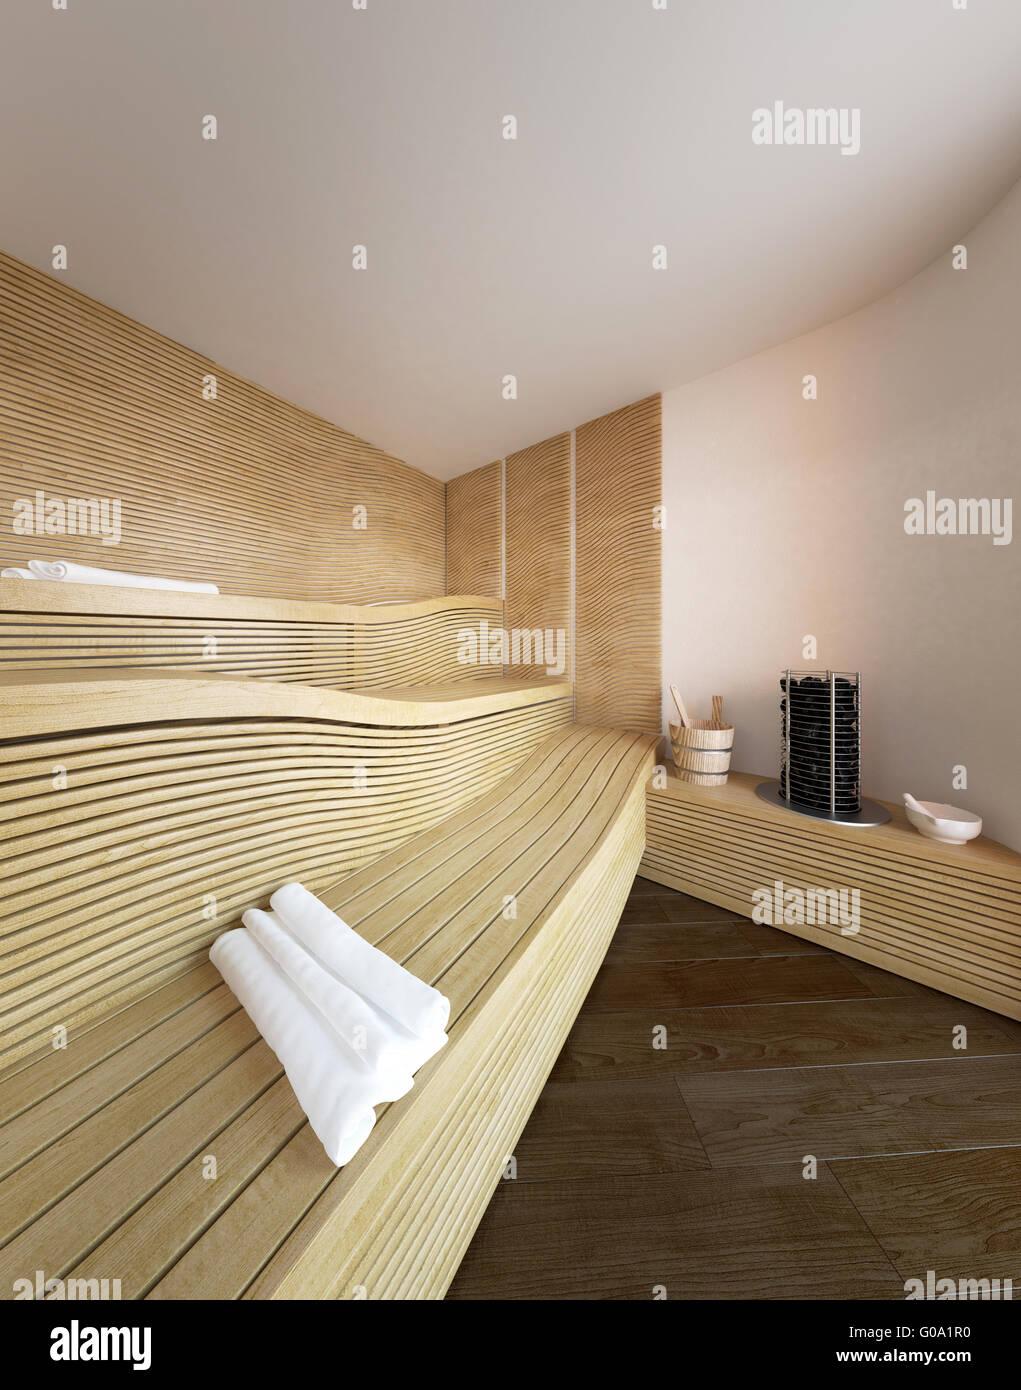 Liege Sauna Simple The Chaps With Liege Sauna Trendy